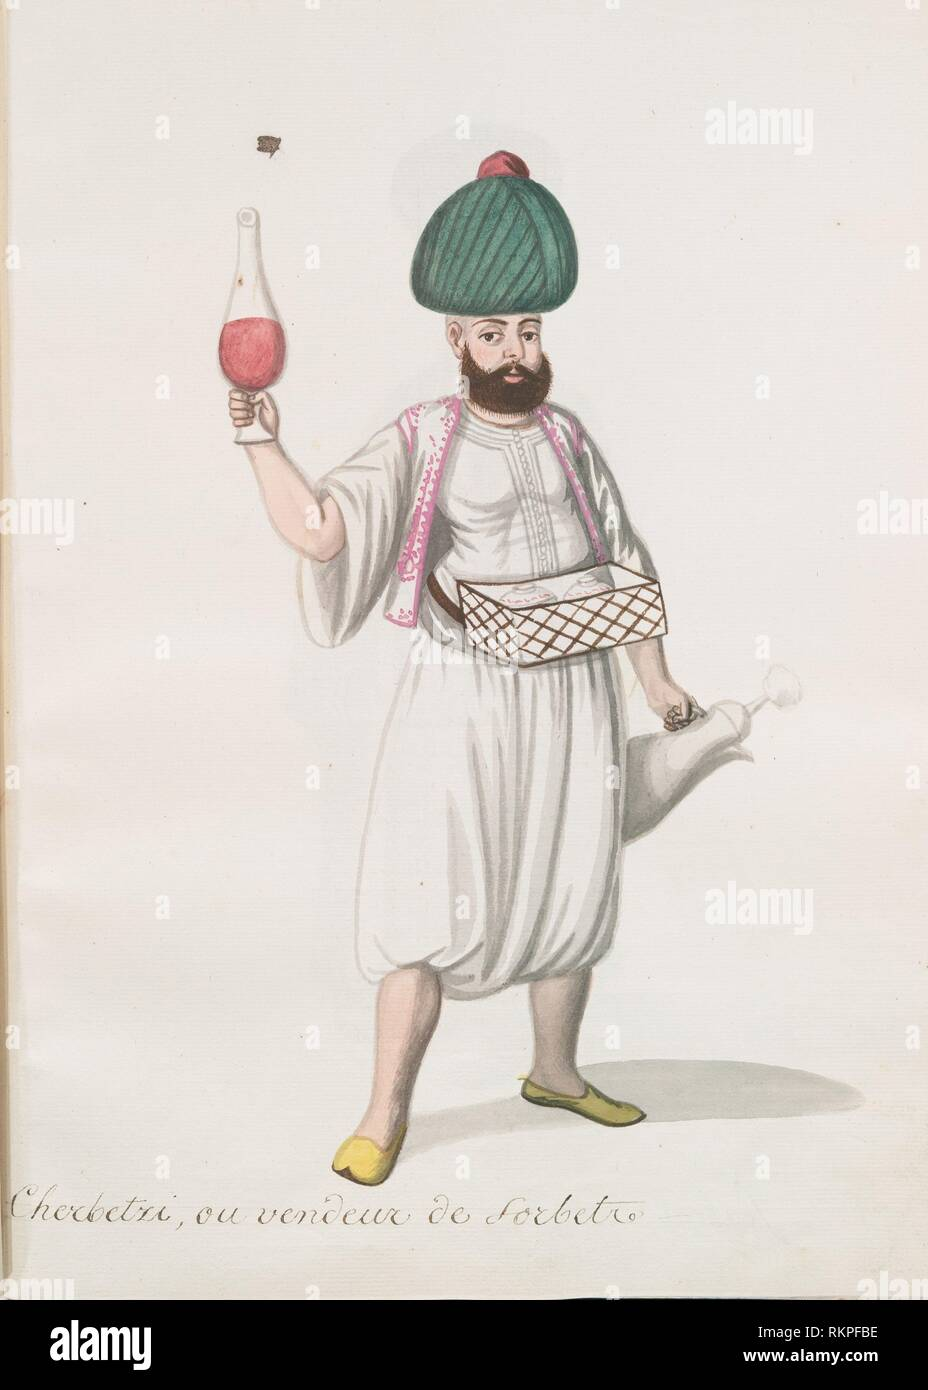 Pintura Turca De Disfraces Imágenes De Stock Pintura Turca